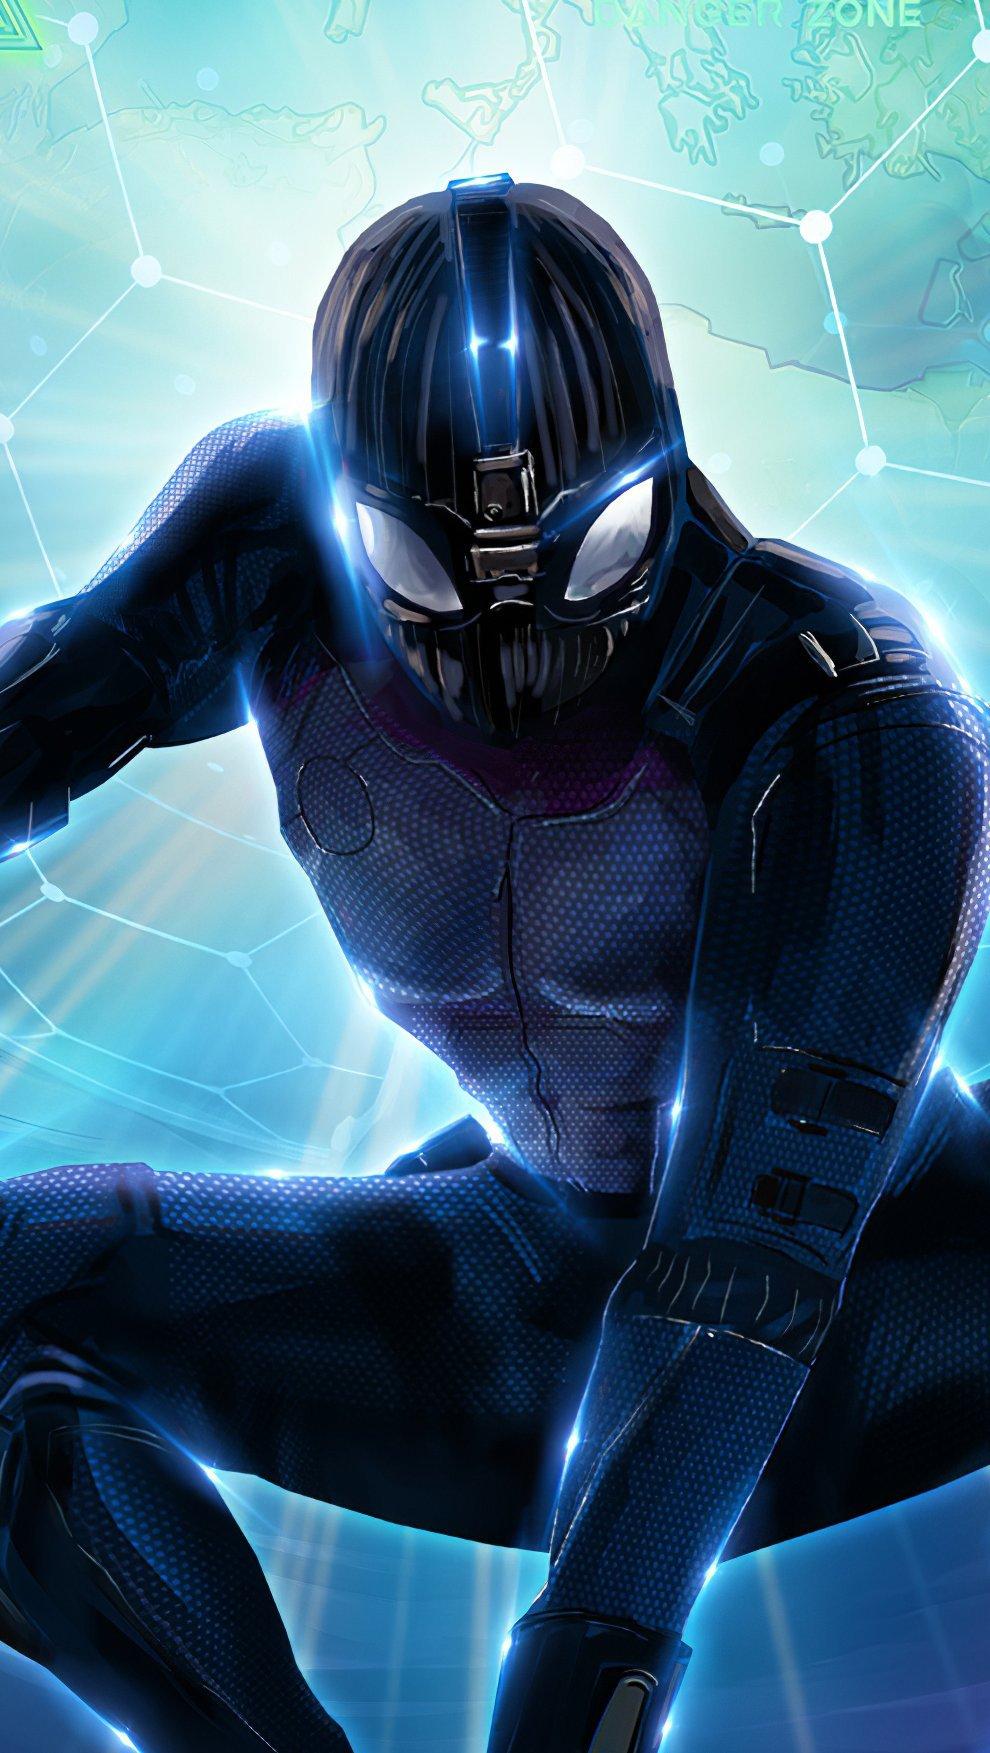 Wallpaper Spiderman Black suit Fanart Vertical